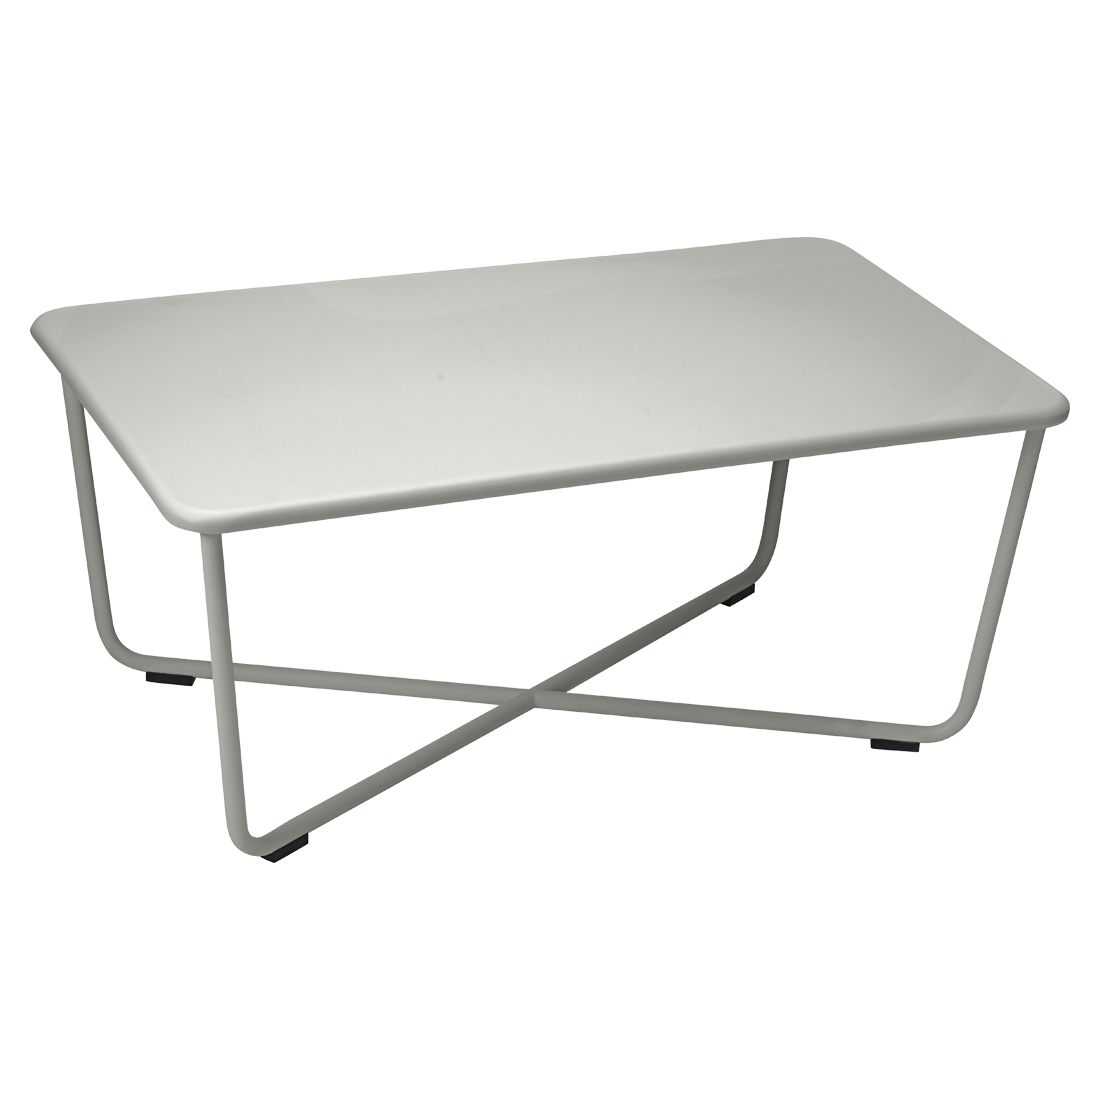 Table basse croisette de fermob romarin - Table basse fermob ...